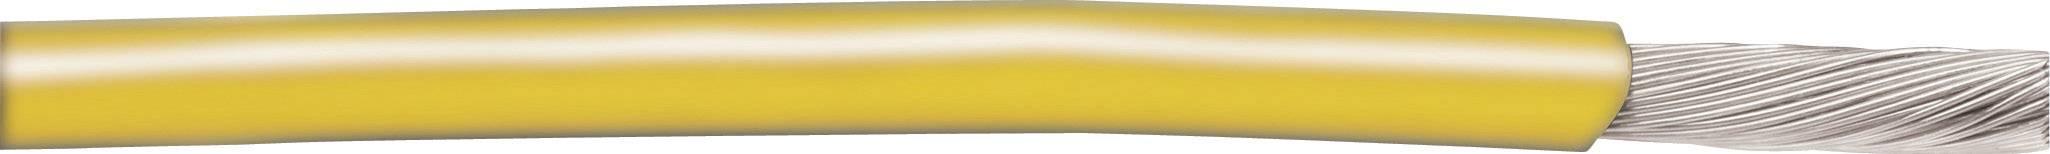 Pletenica EcoWire 1 x 0.82 mm, rumena AlphaWire 6715 30.5 m